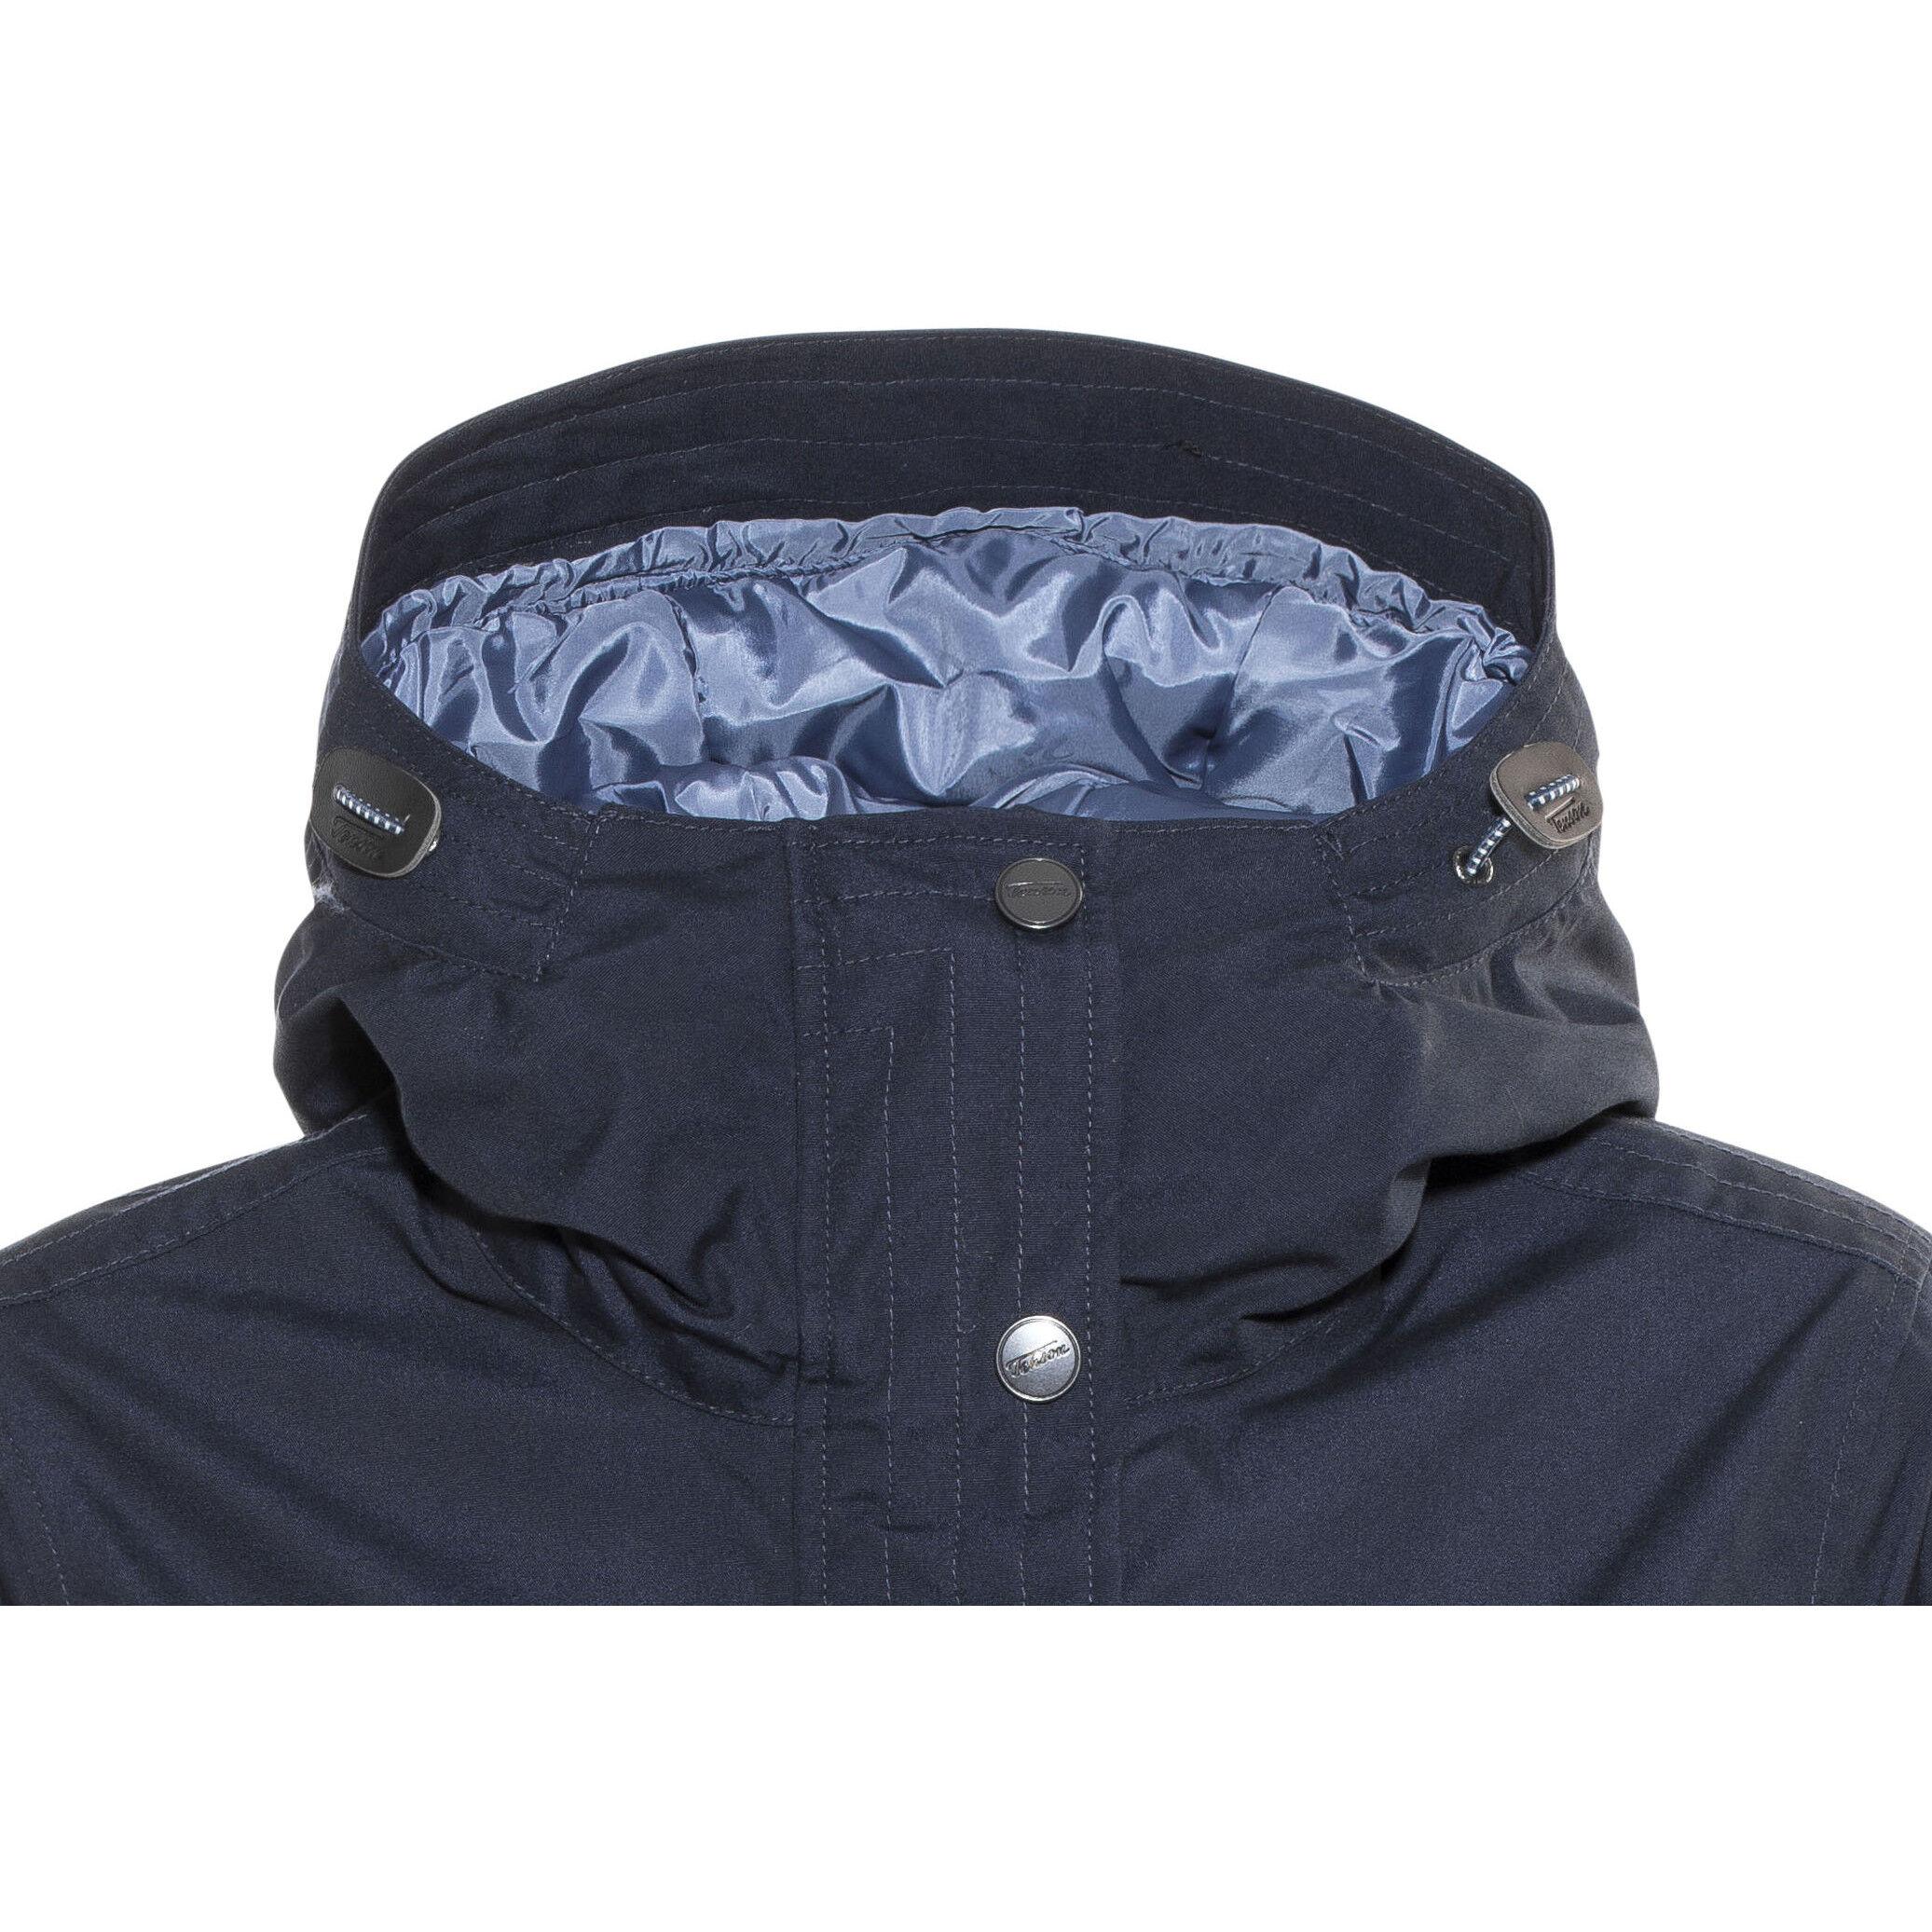 Jacken Manjo M's Jacket Tatonka   Rucksäcke, Zelte